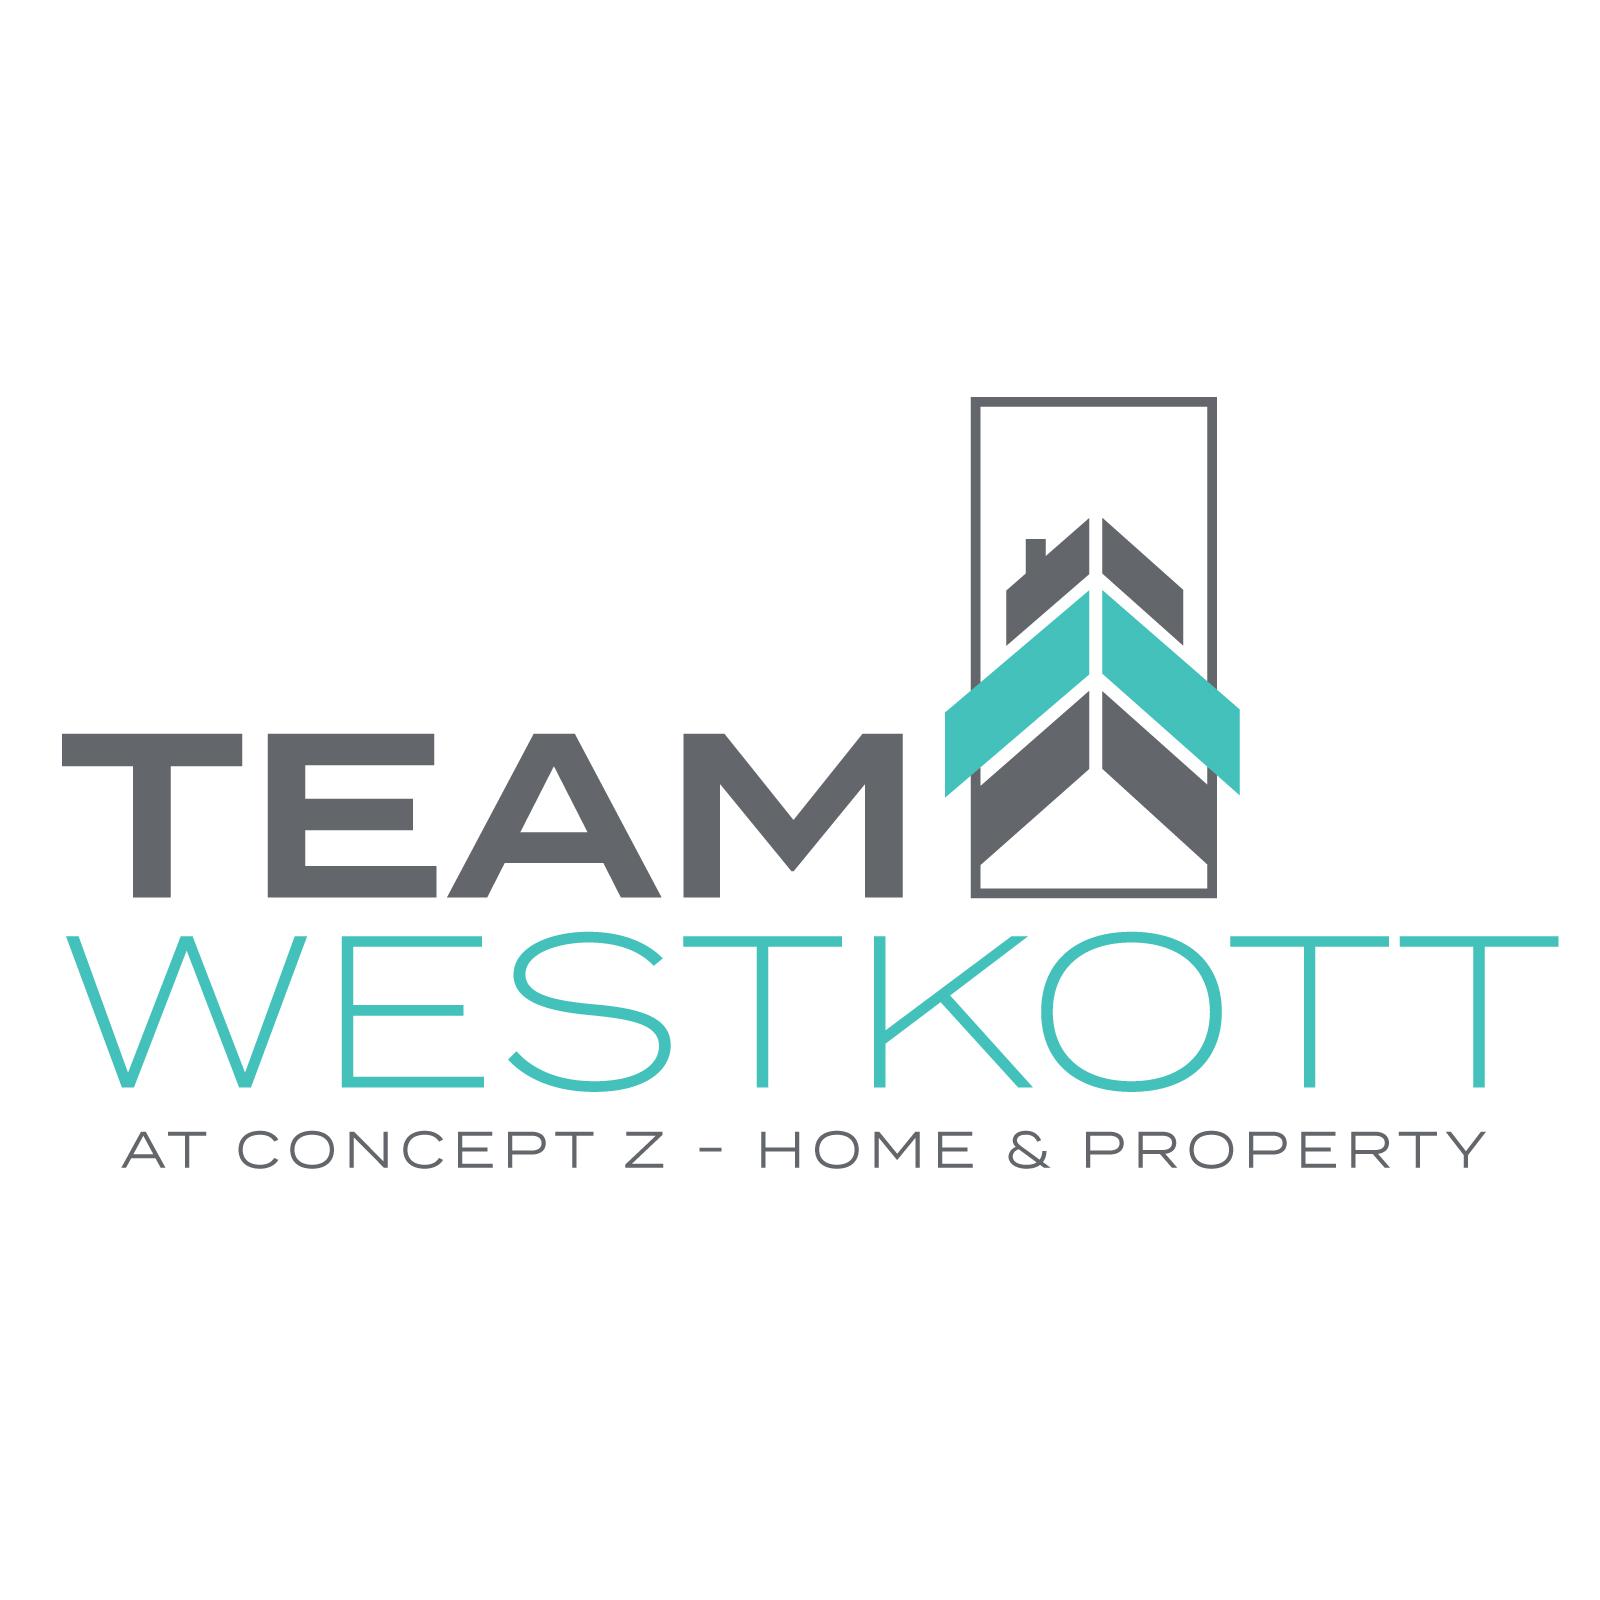 Team Westkott at Concept Z branding